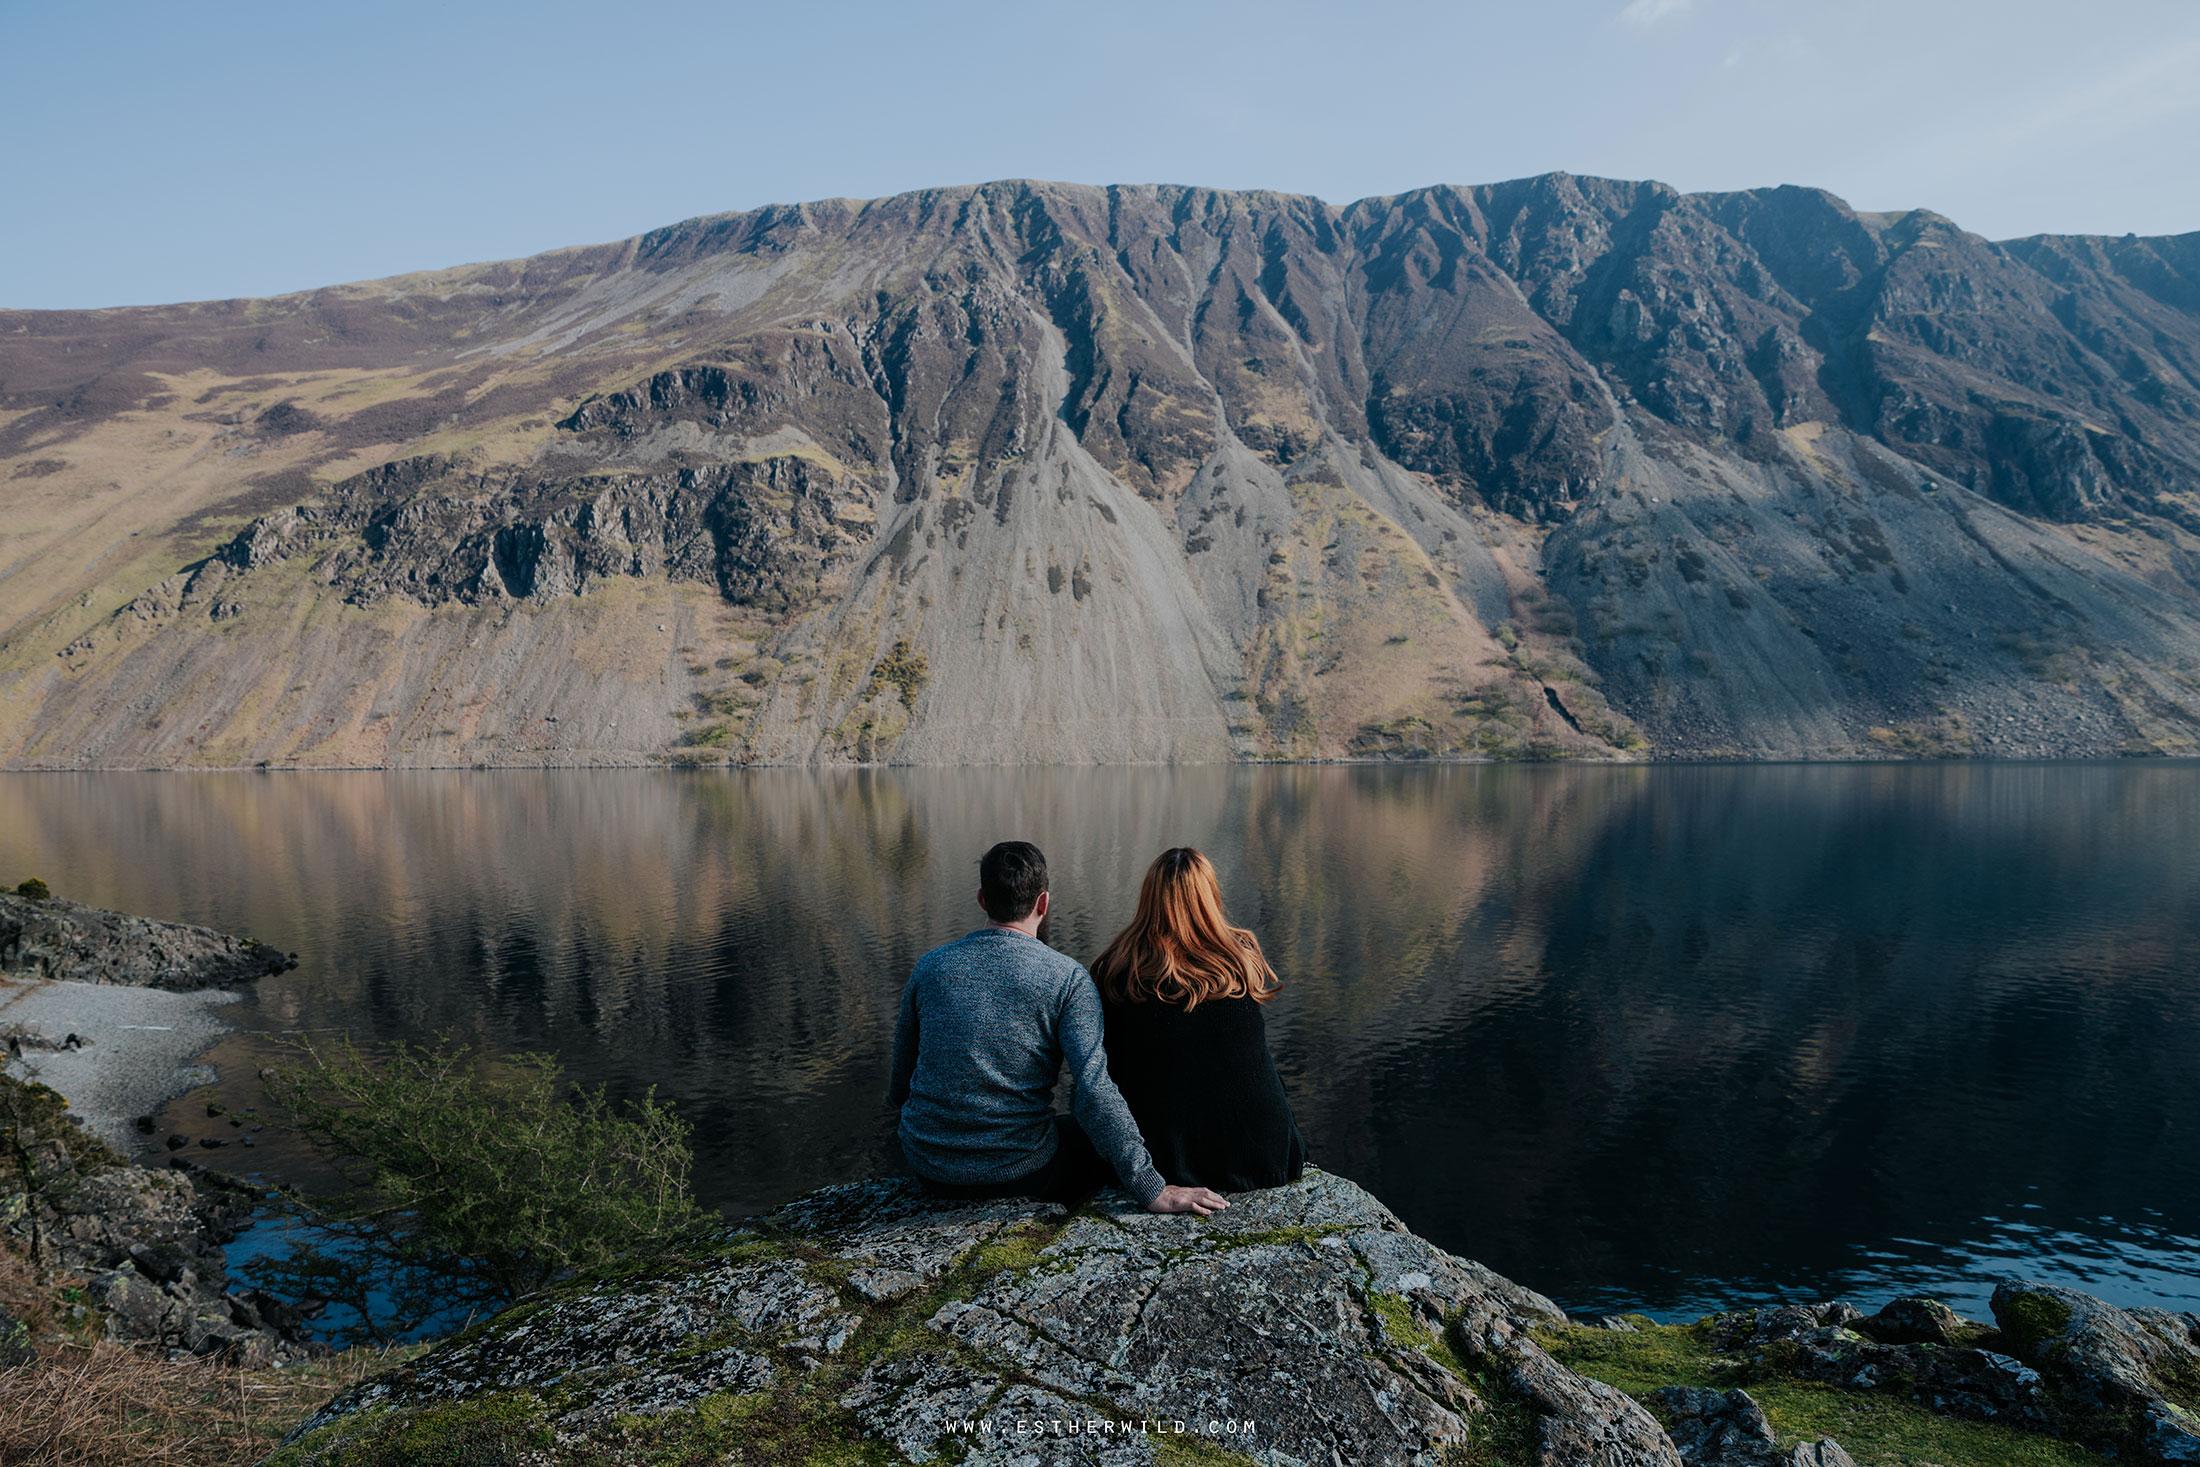 Cumbria_Lake_District_Wasdale_Wedding_Photographer_Destination_Engagement_Anniversary_Esther_Wild_IMG_3240.jpg